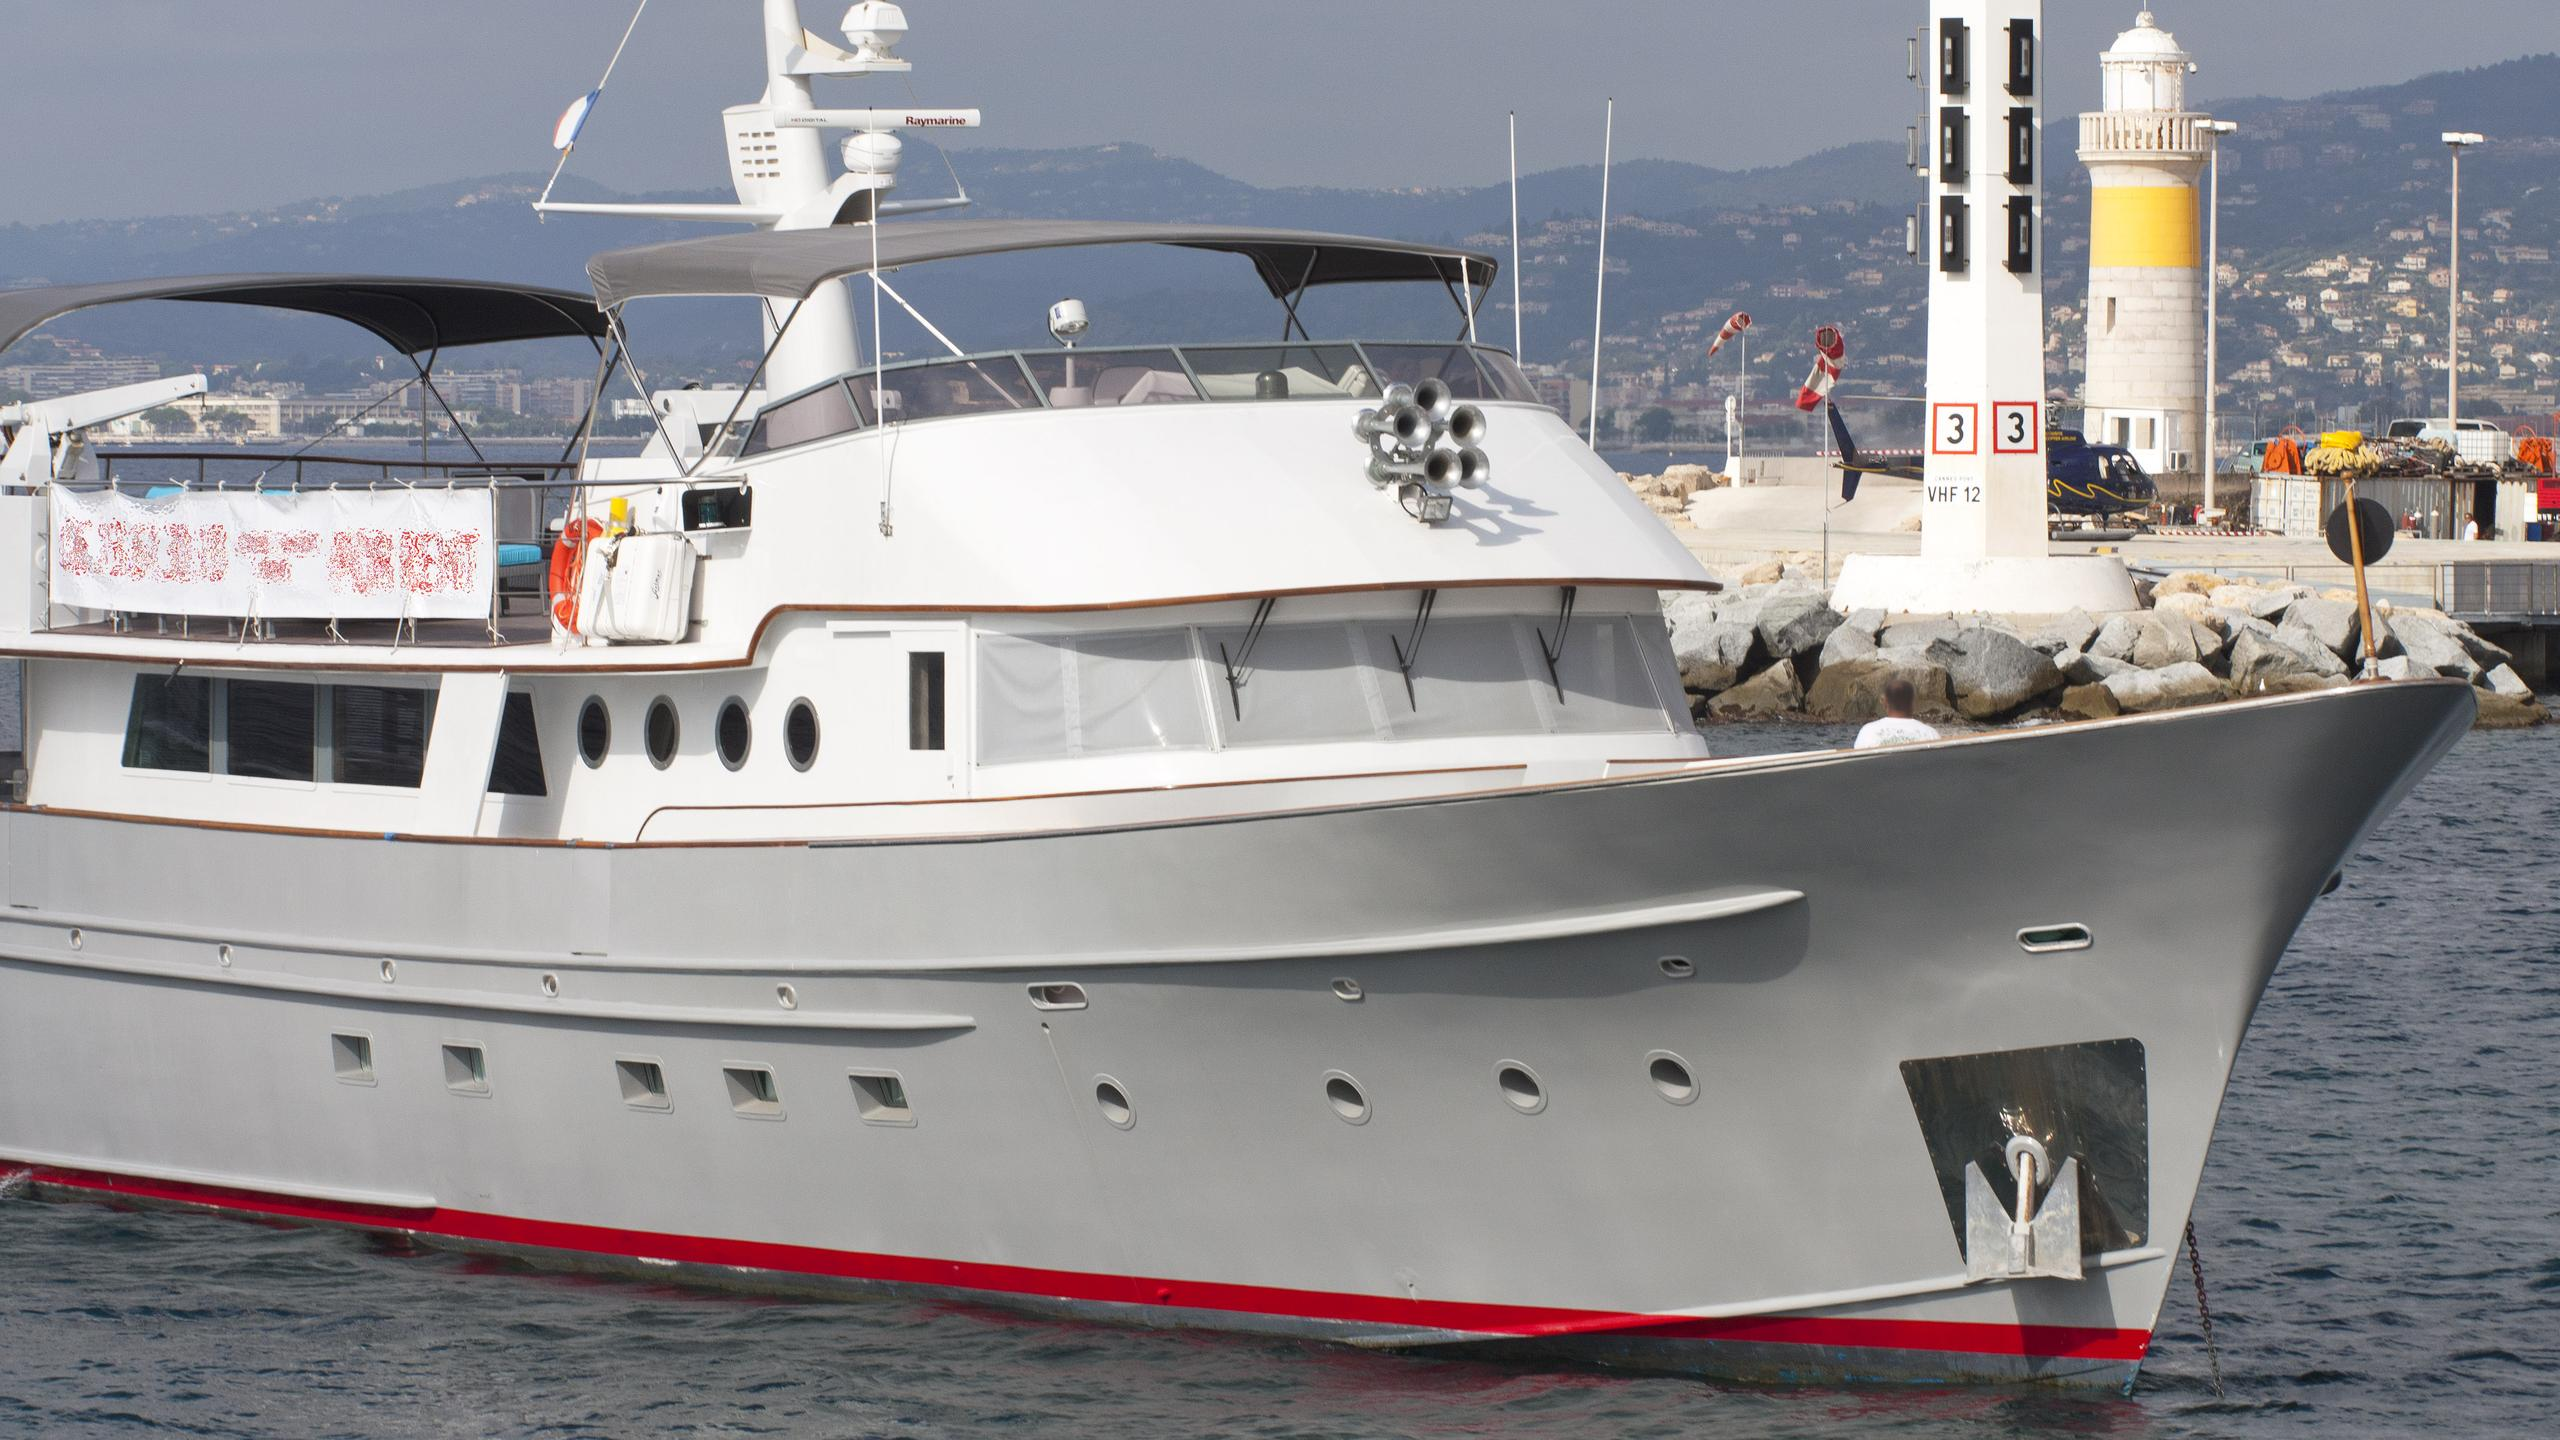 mojito-motor-yacht-breaux-baycraft-1969-33m-half-profile